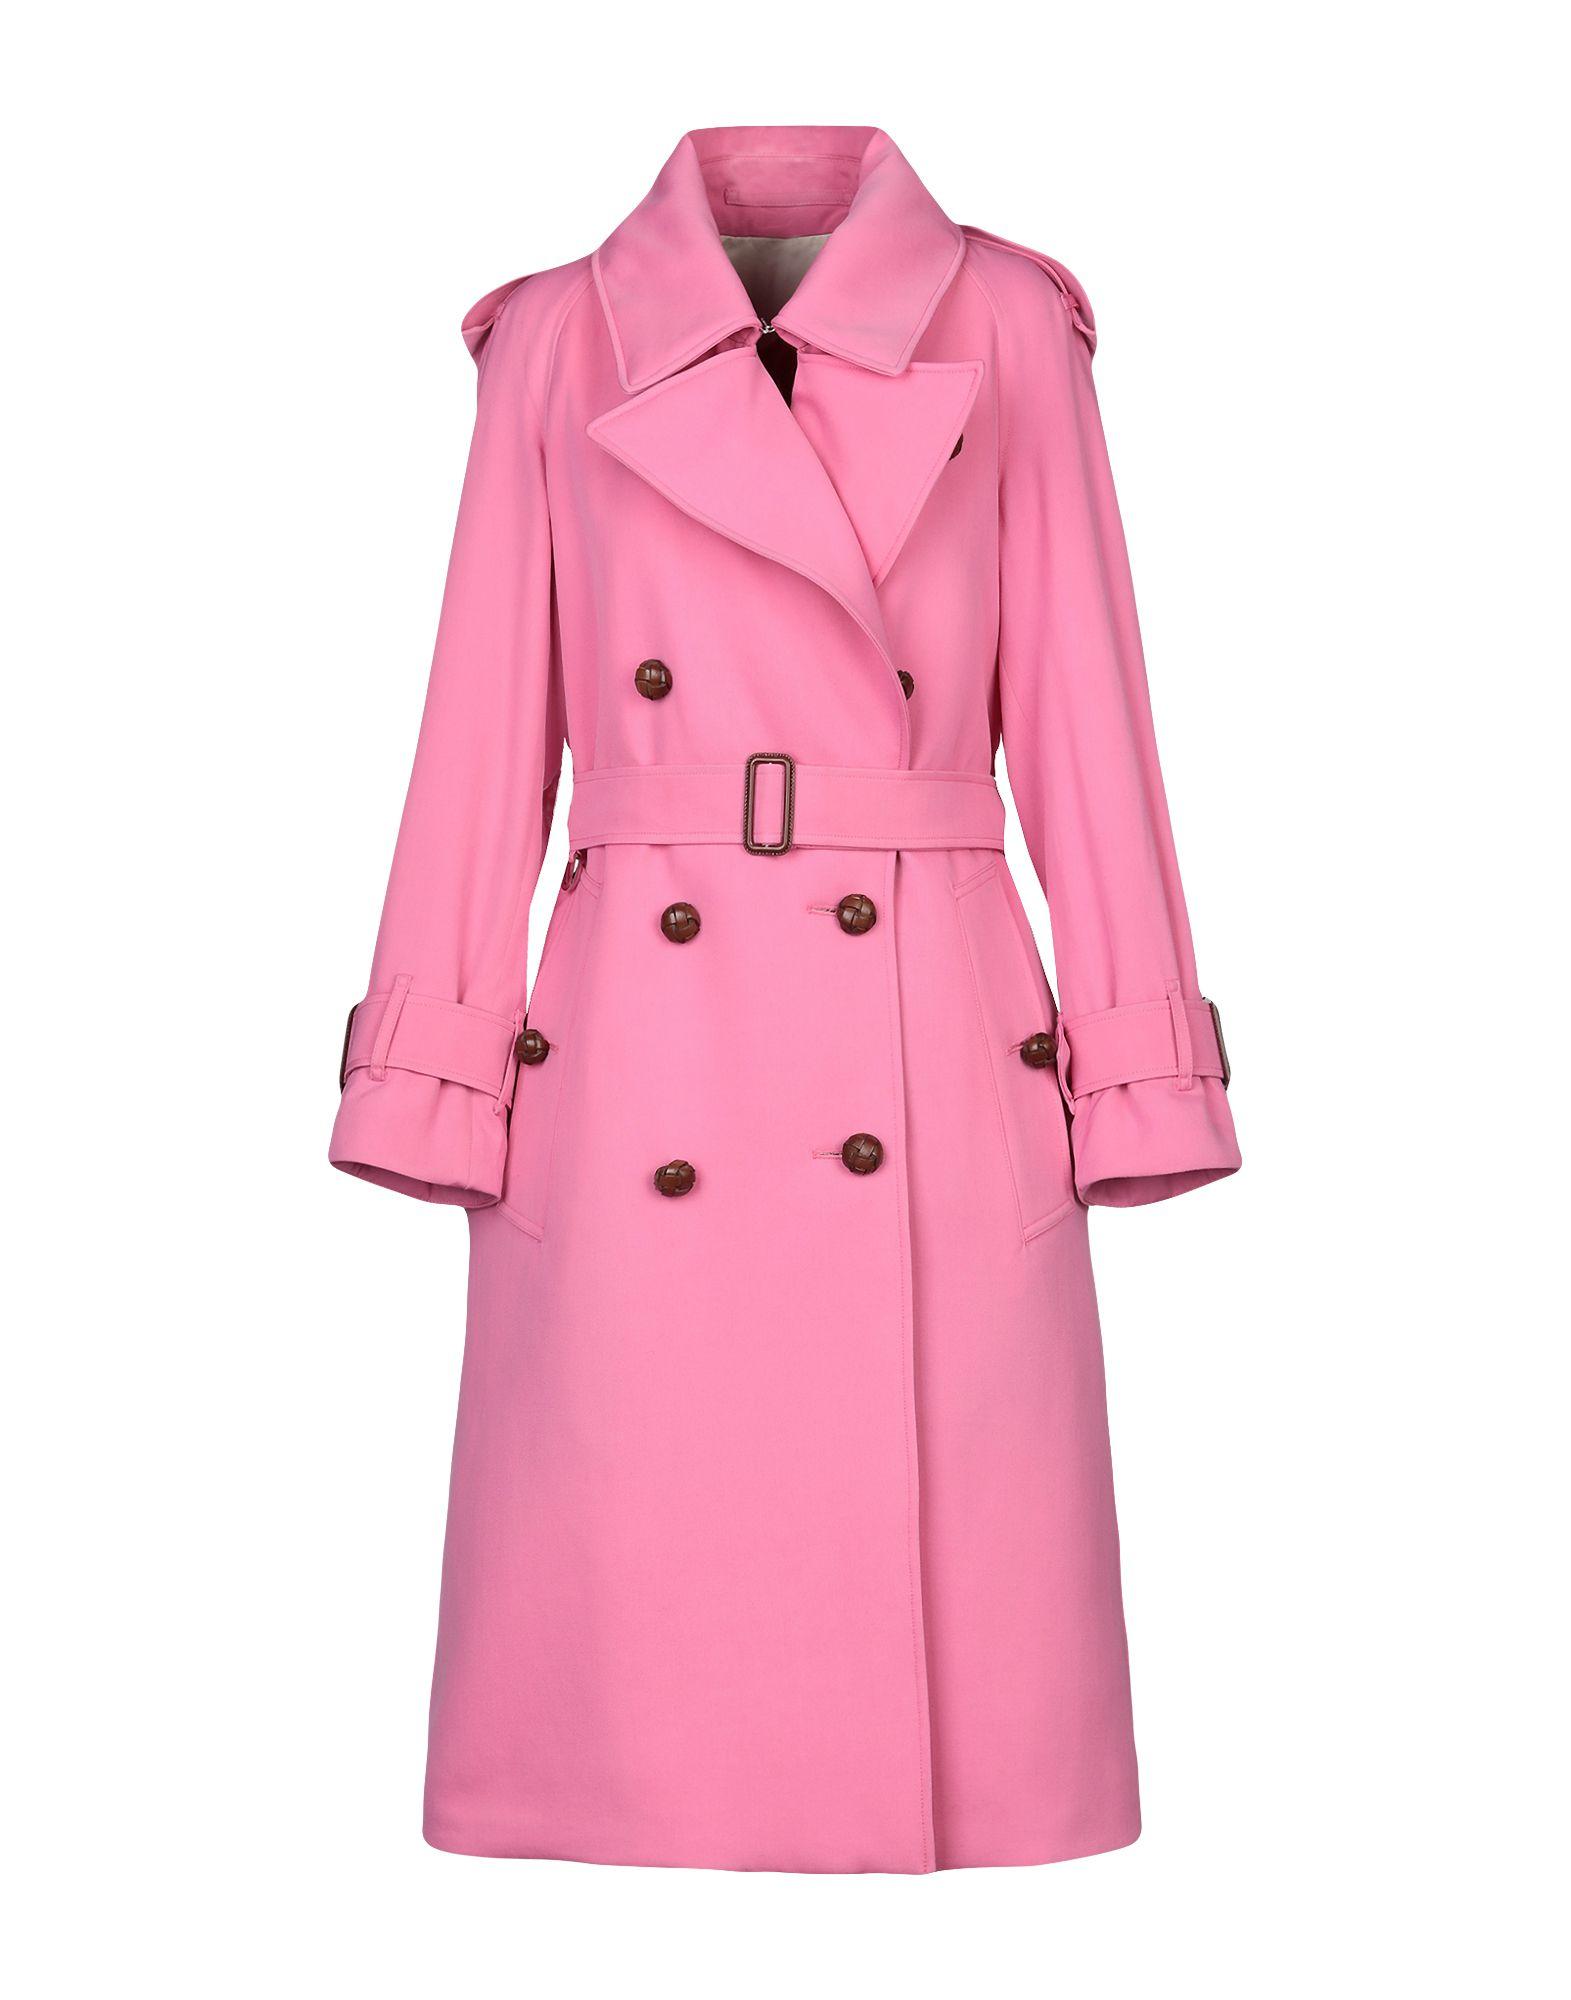 b1345d83e45 Buy burberry clothing for women - Best women's burberry clothing shop -  Cools.com